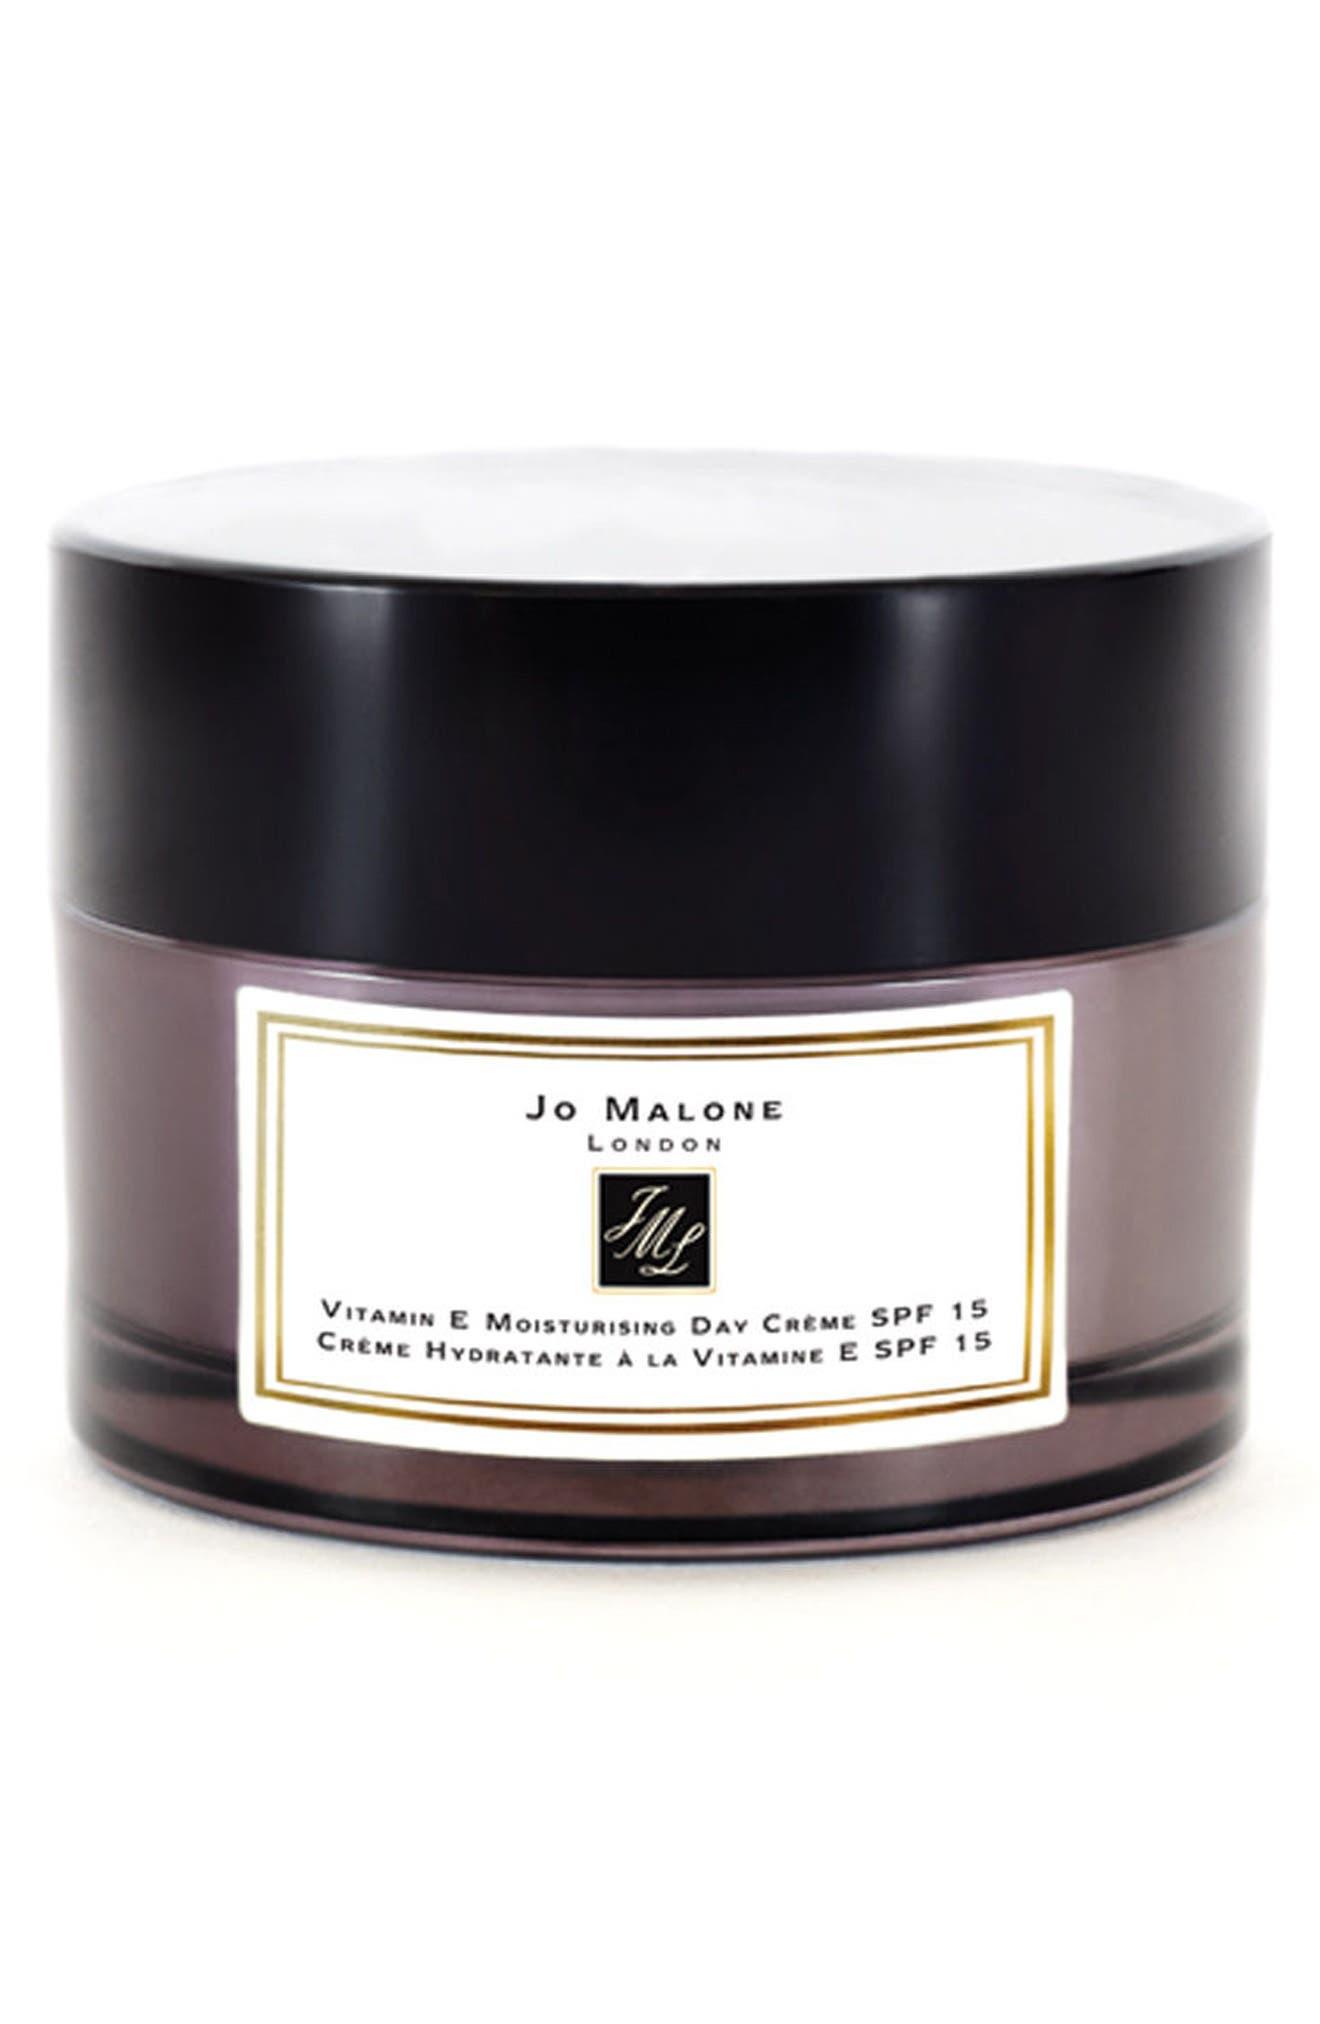 Alternate Image 1 Selected - Jo Malone London™ Vitamin E Moisturizing Day Crème Broad Spectrum SPF 15